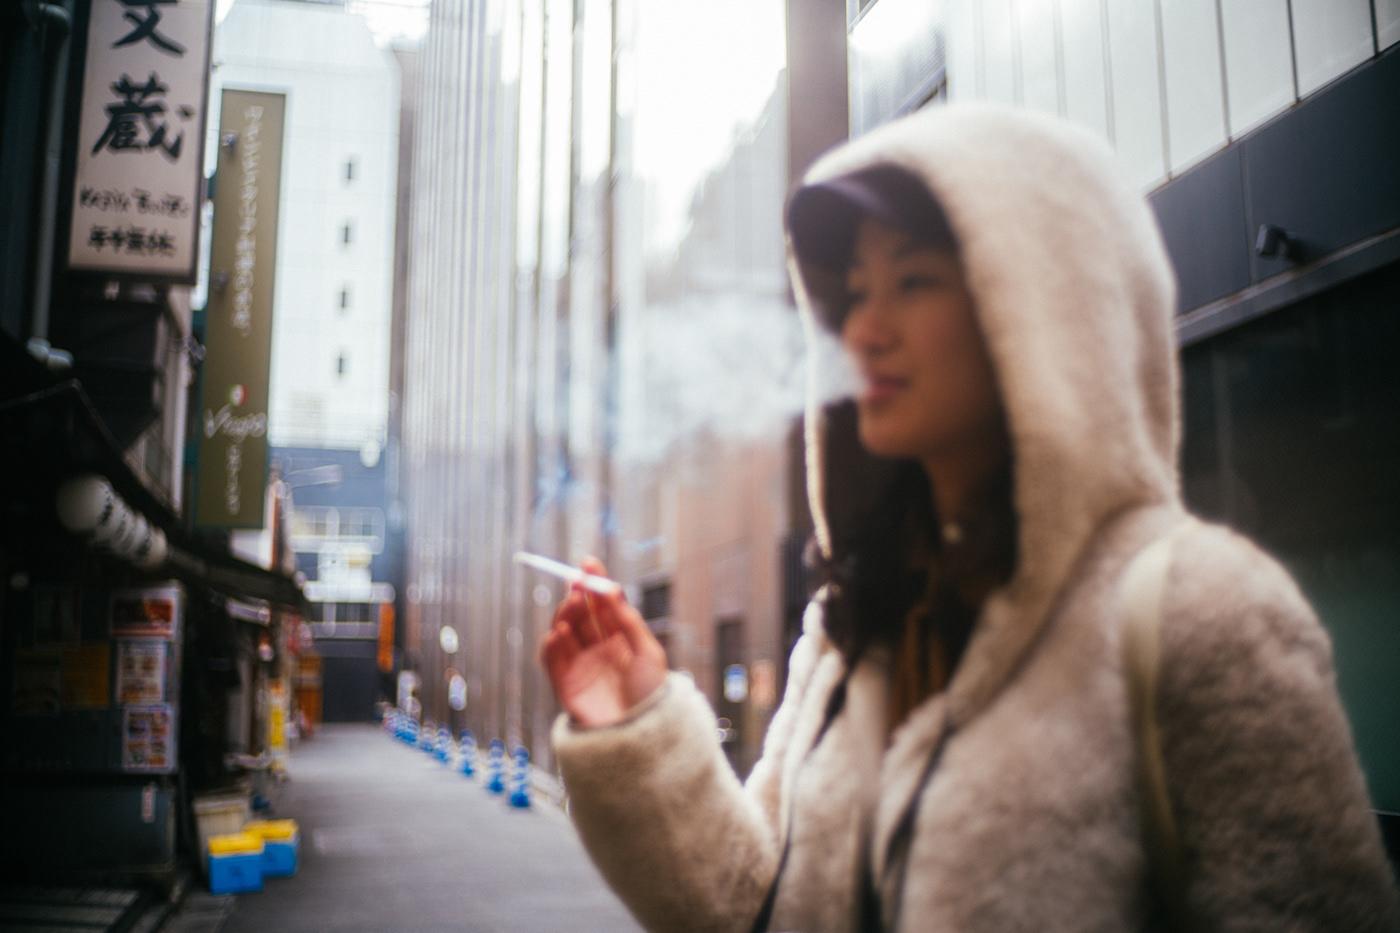 tokyo asia mood Documentary  andre josselin leica m10p Leica osaka kyoto 35mm